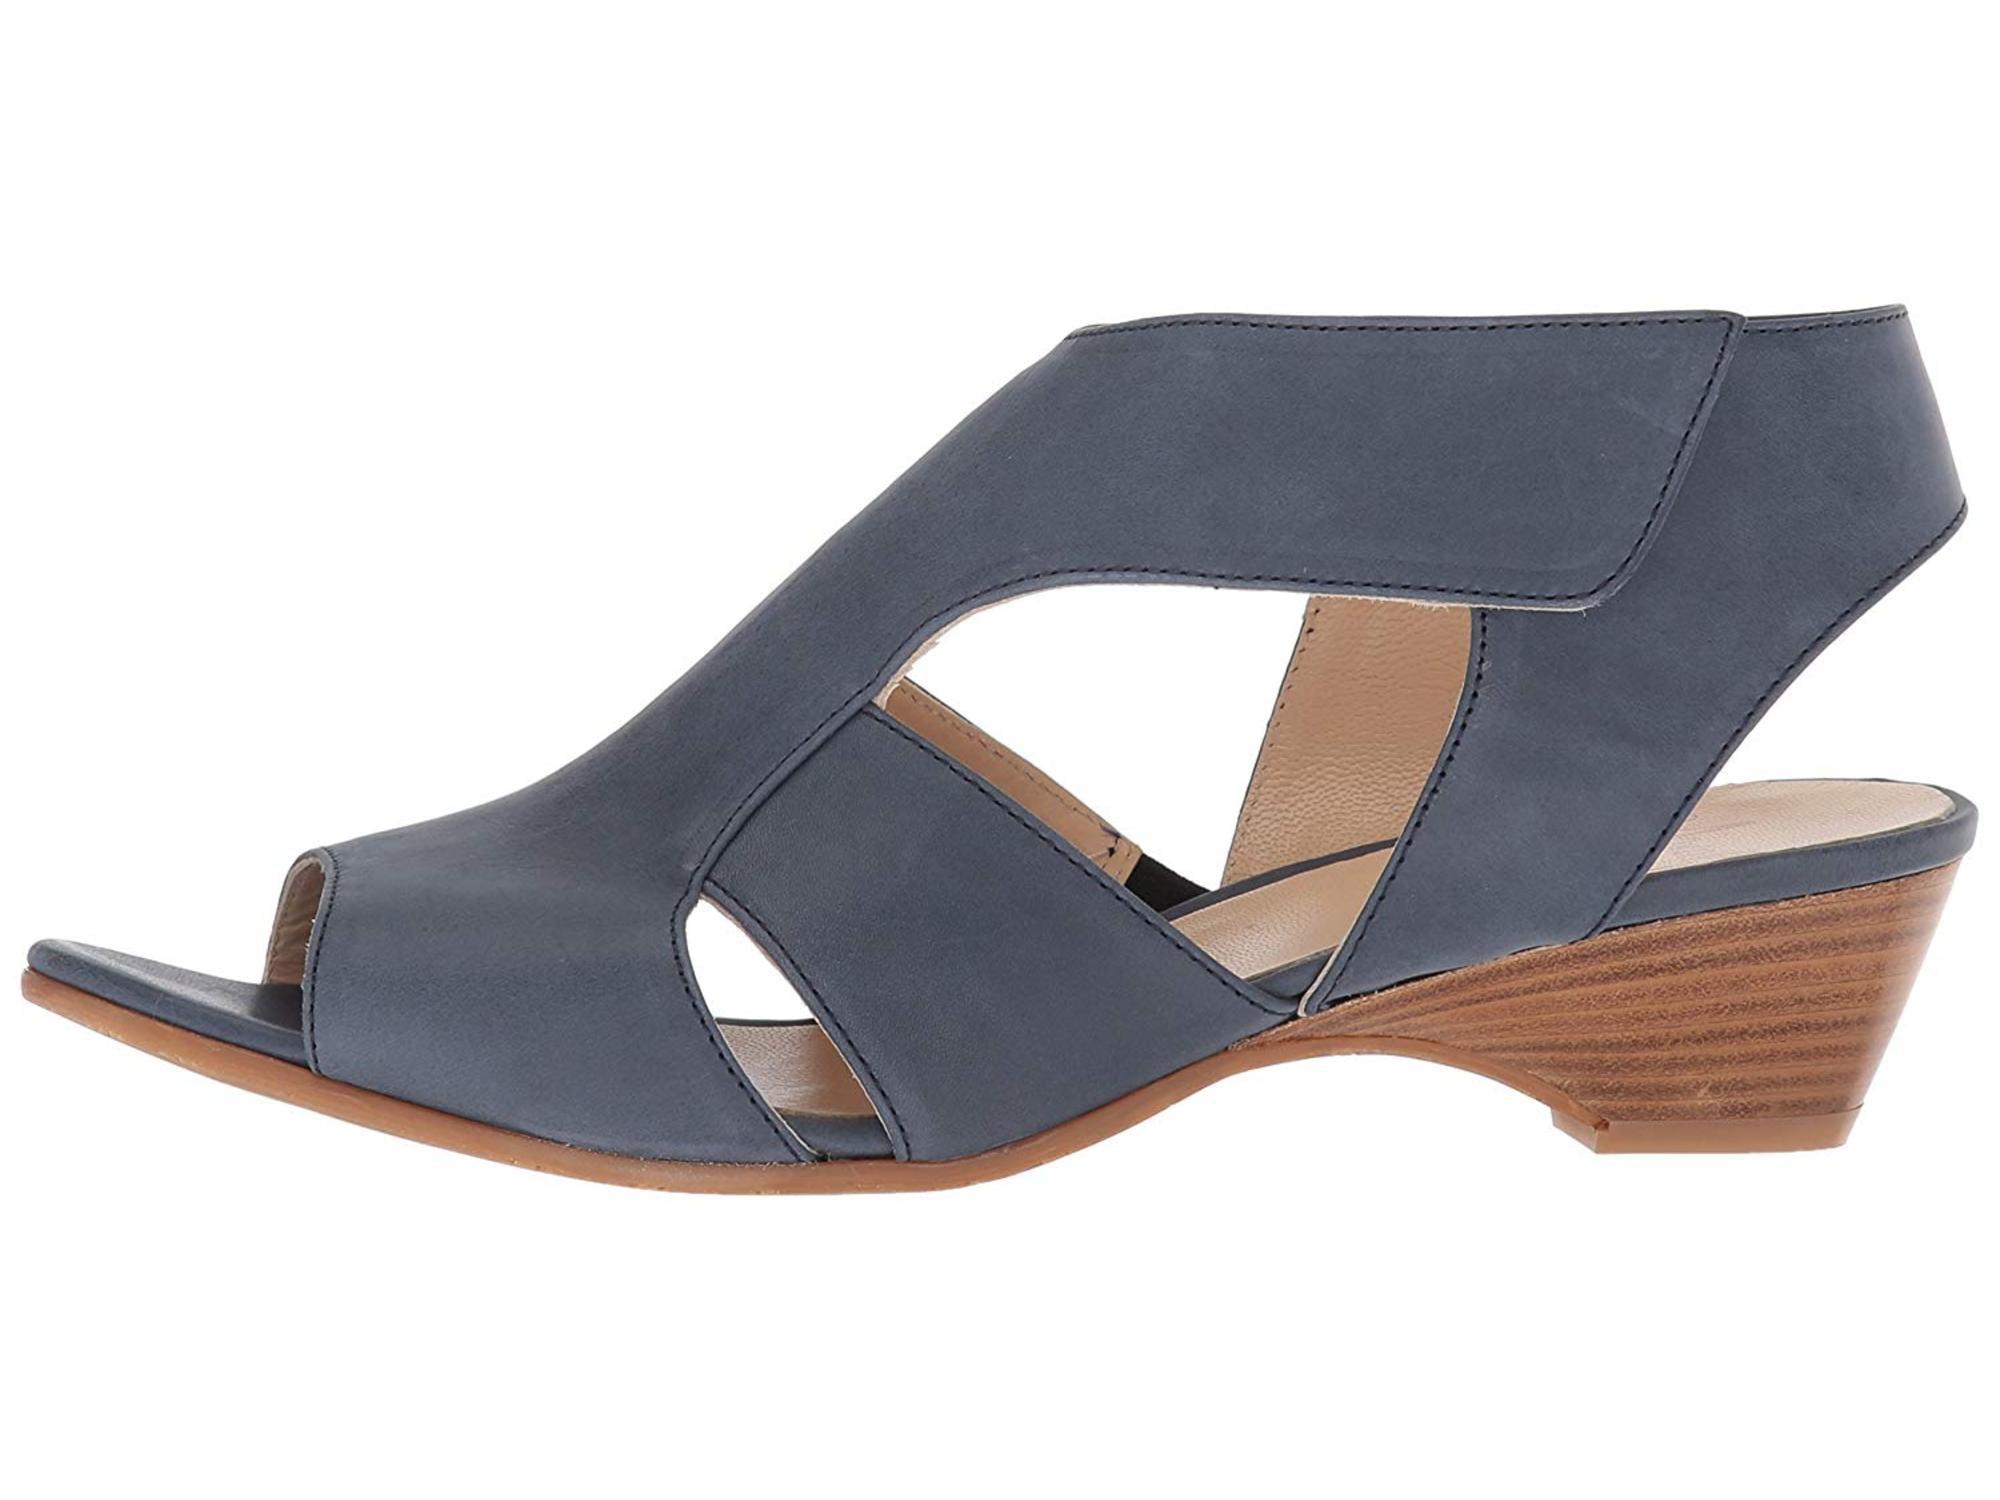 Amalfi By Rangoni Womens Doris Open Toe Casual Slingback Sandals by Amalfi by Rangoni